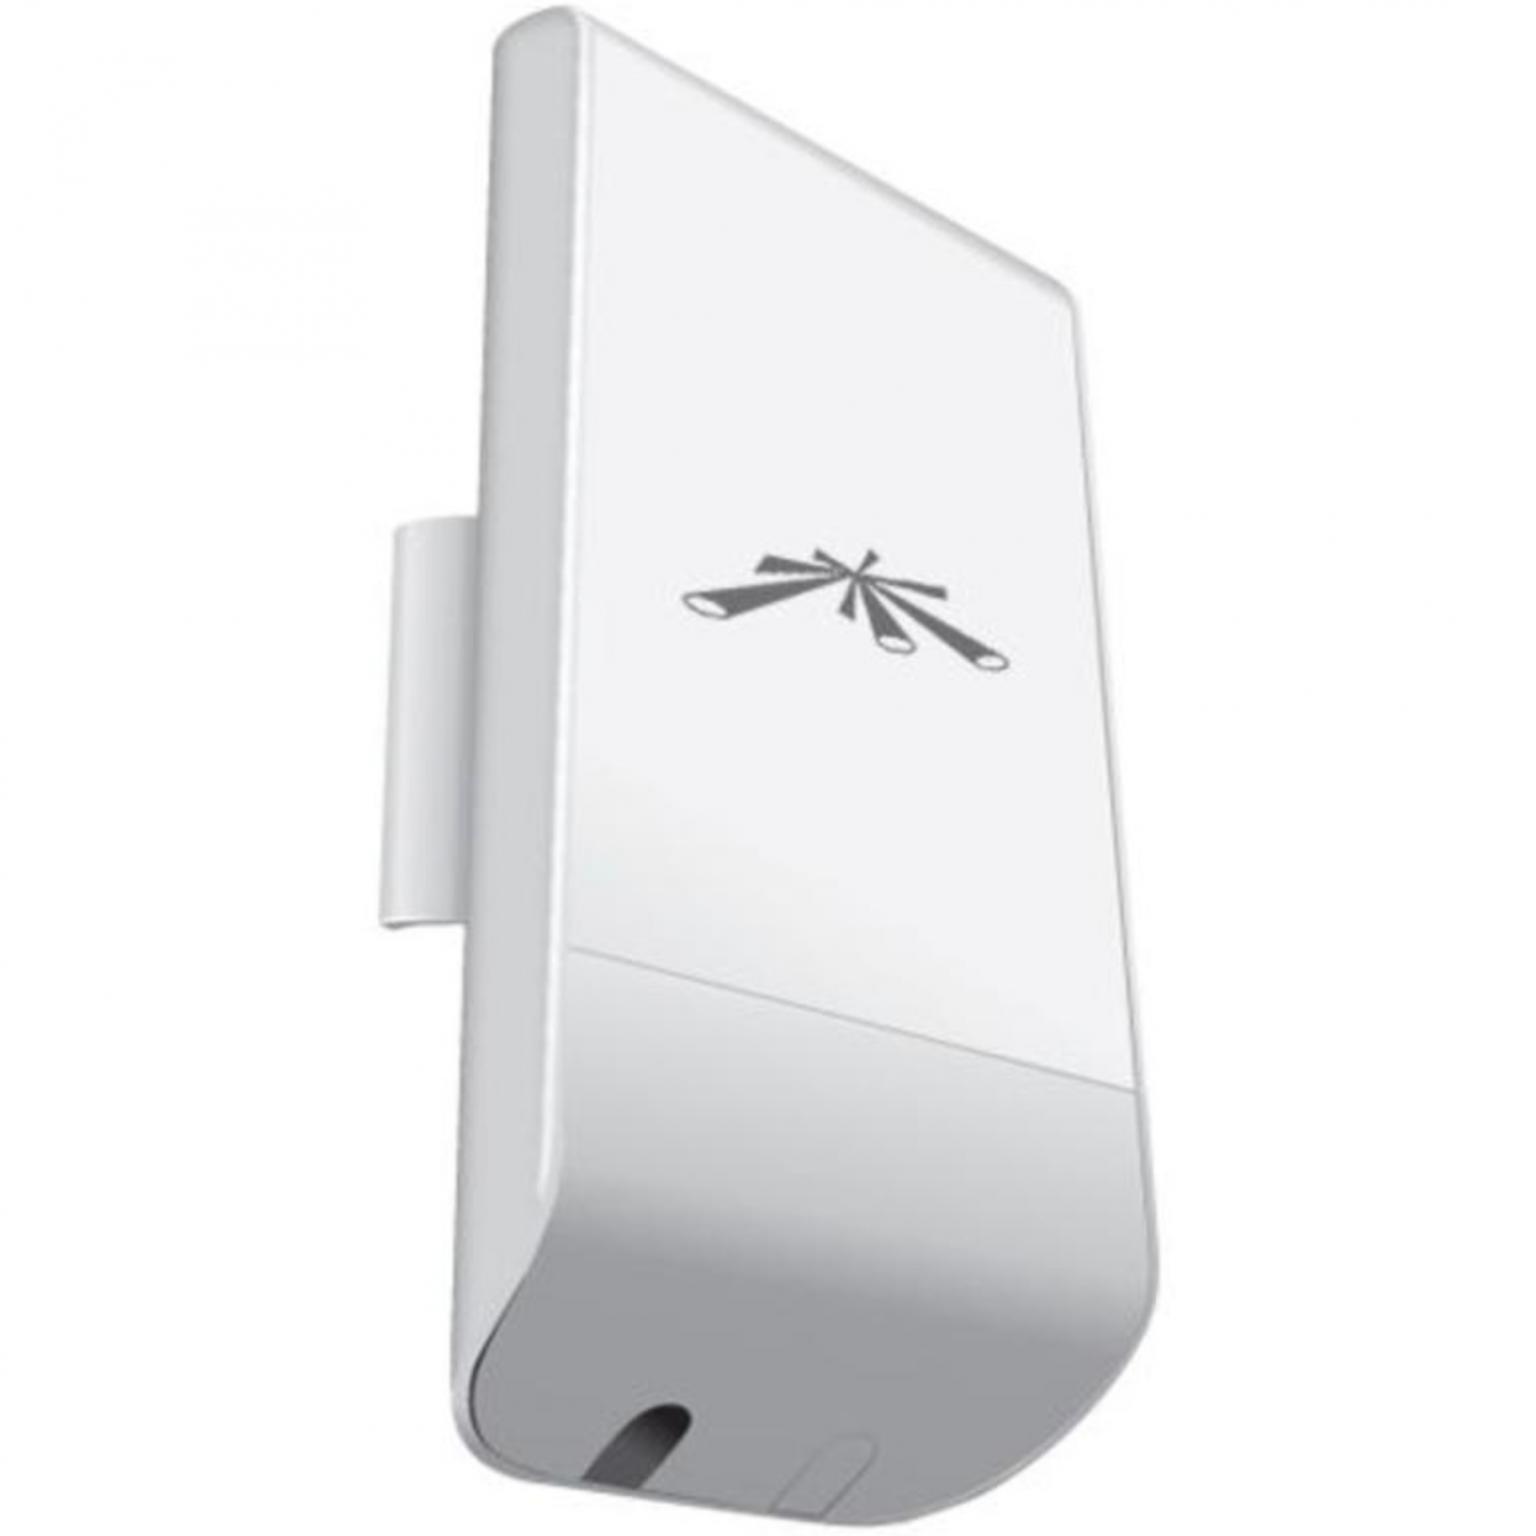 Afbeelding van 150 Mbps Power over Ethernet (PoE) Ubiquiti